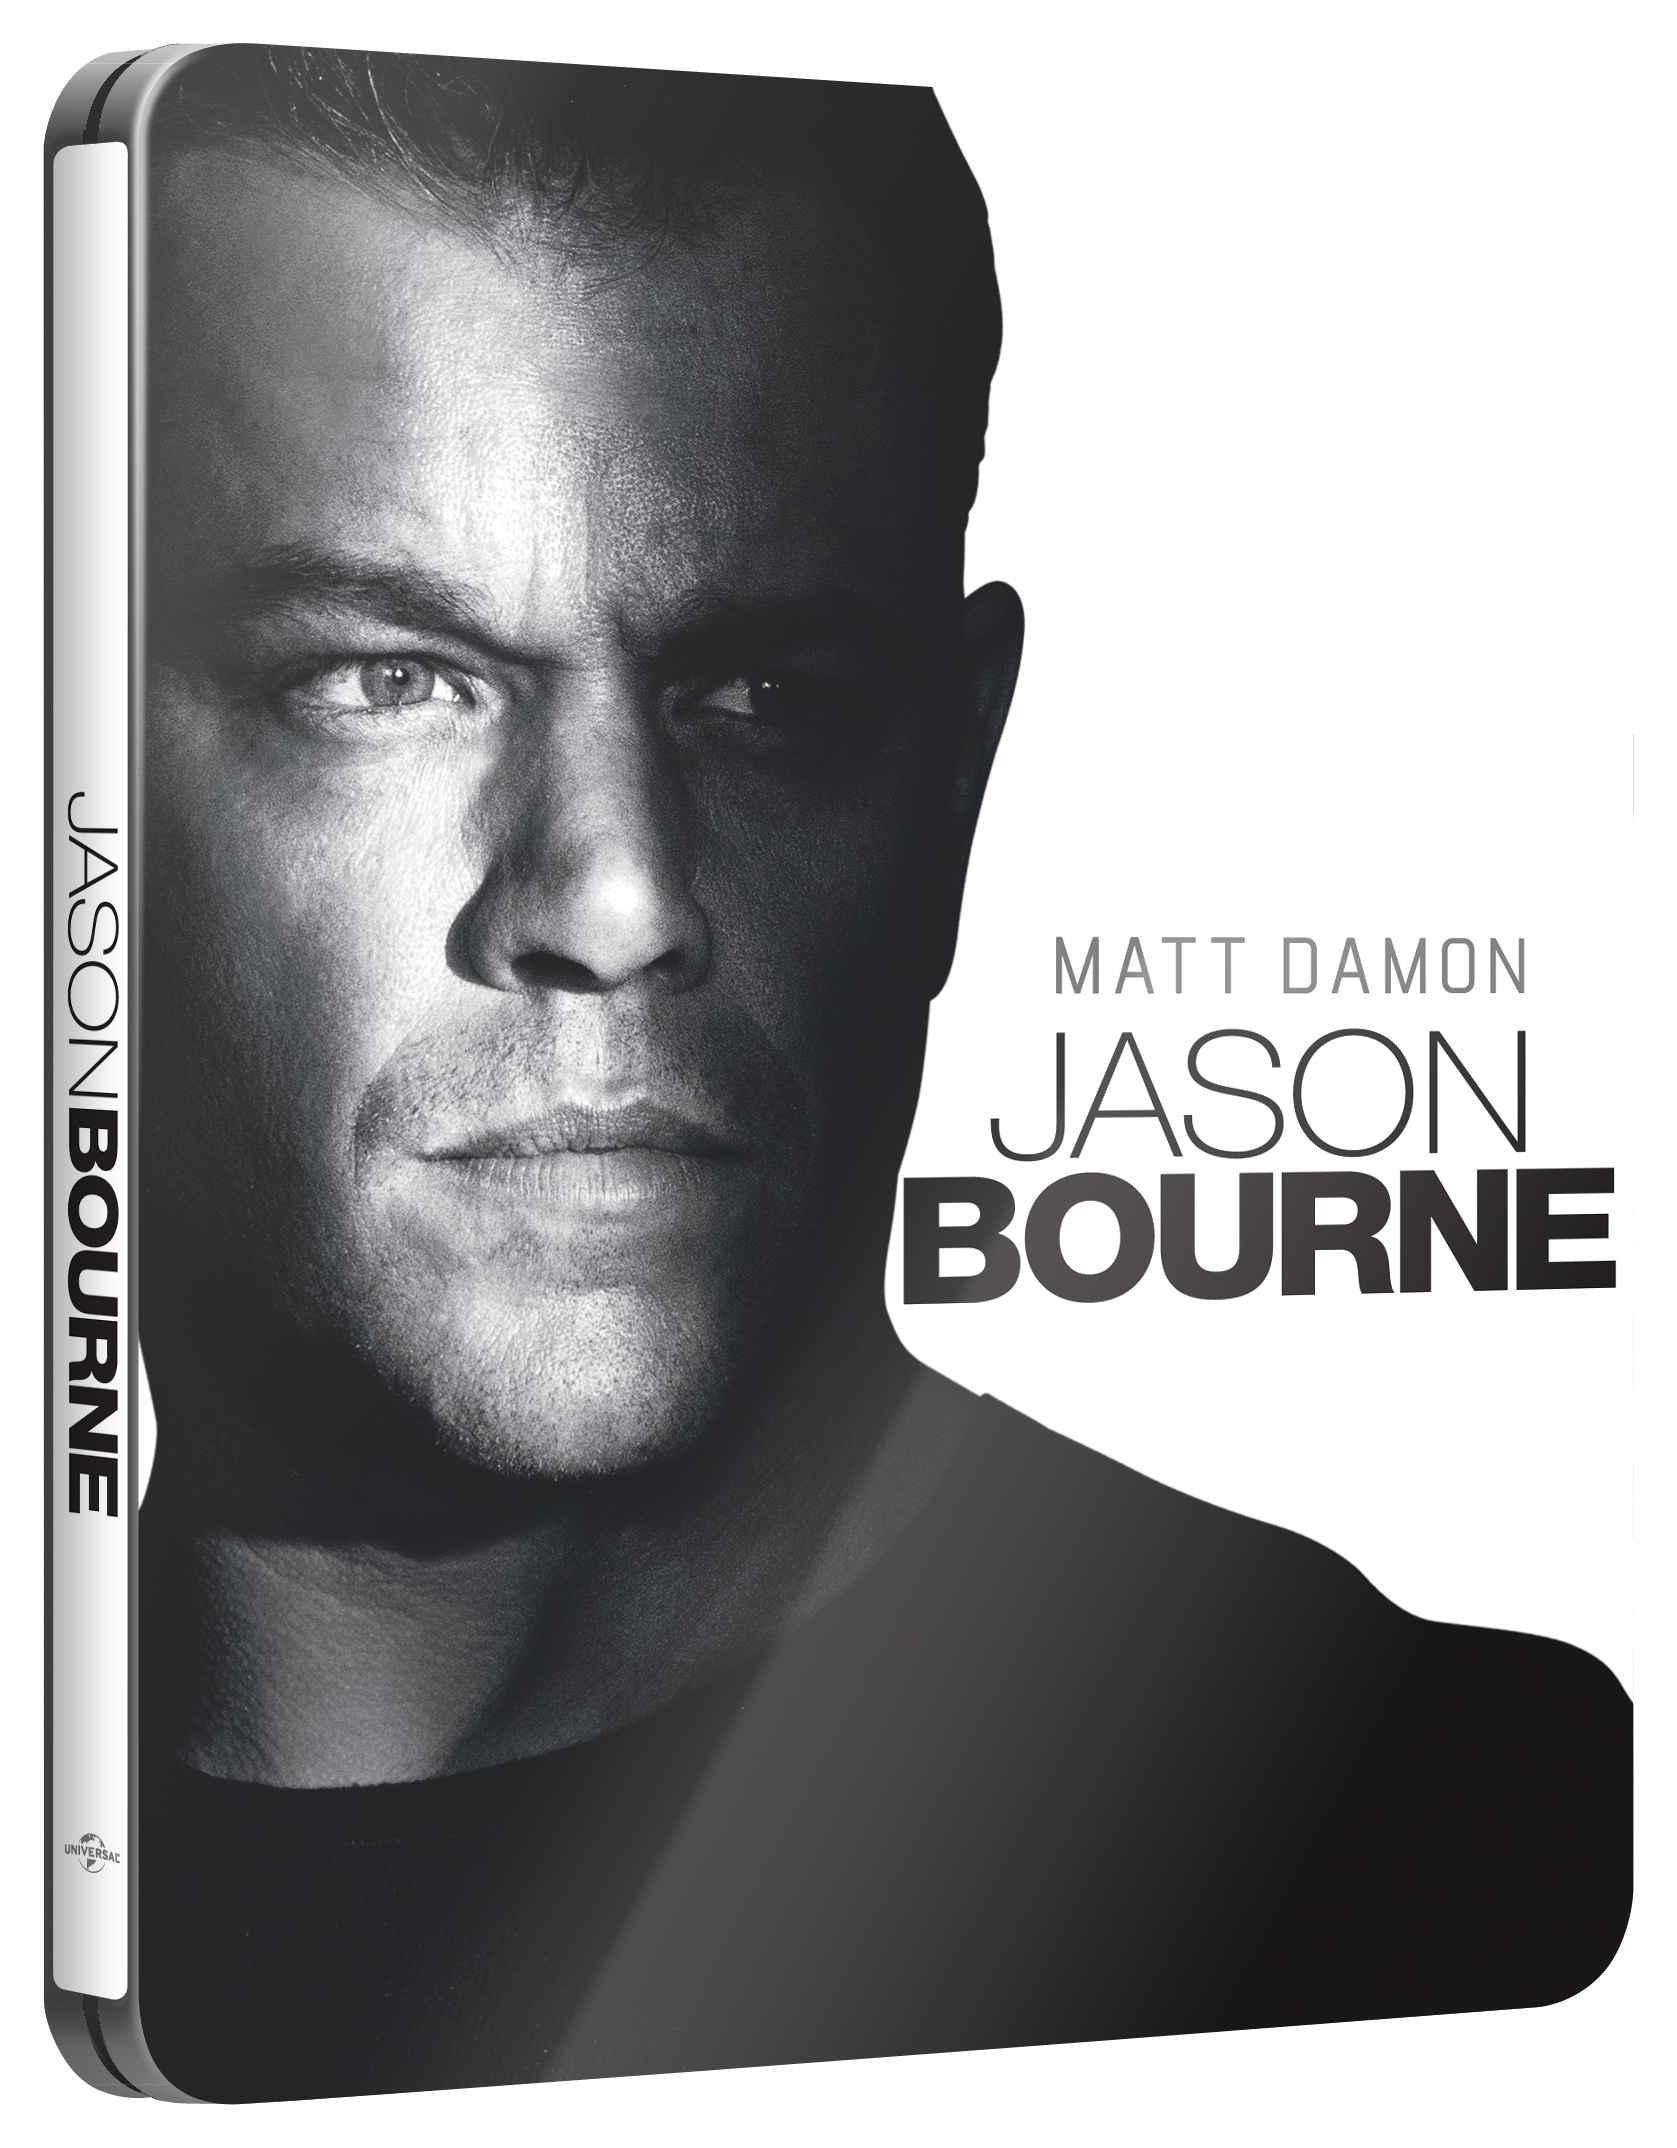 JASON BOURNE (BD + DVD) - Blu-ray STEELBOOK